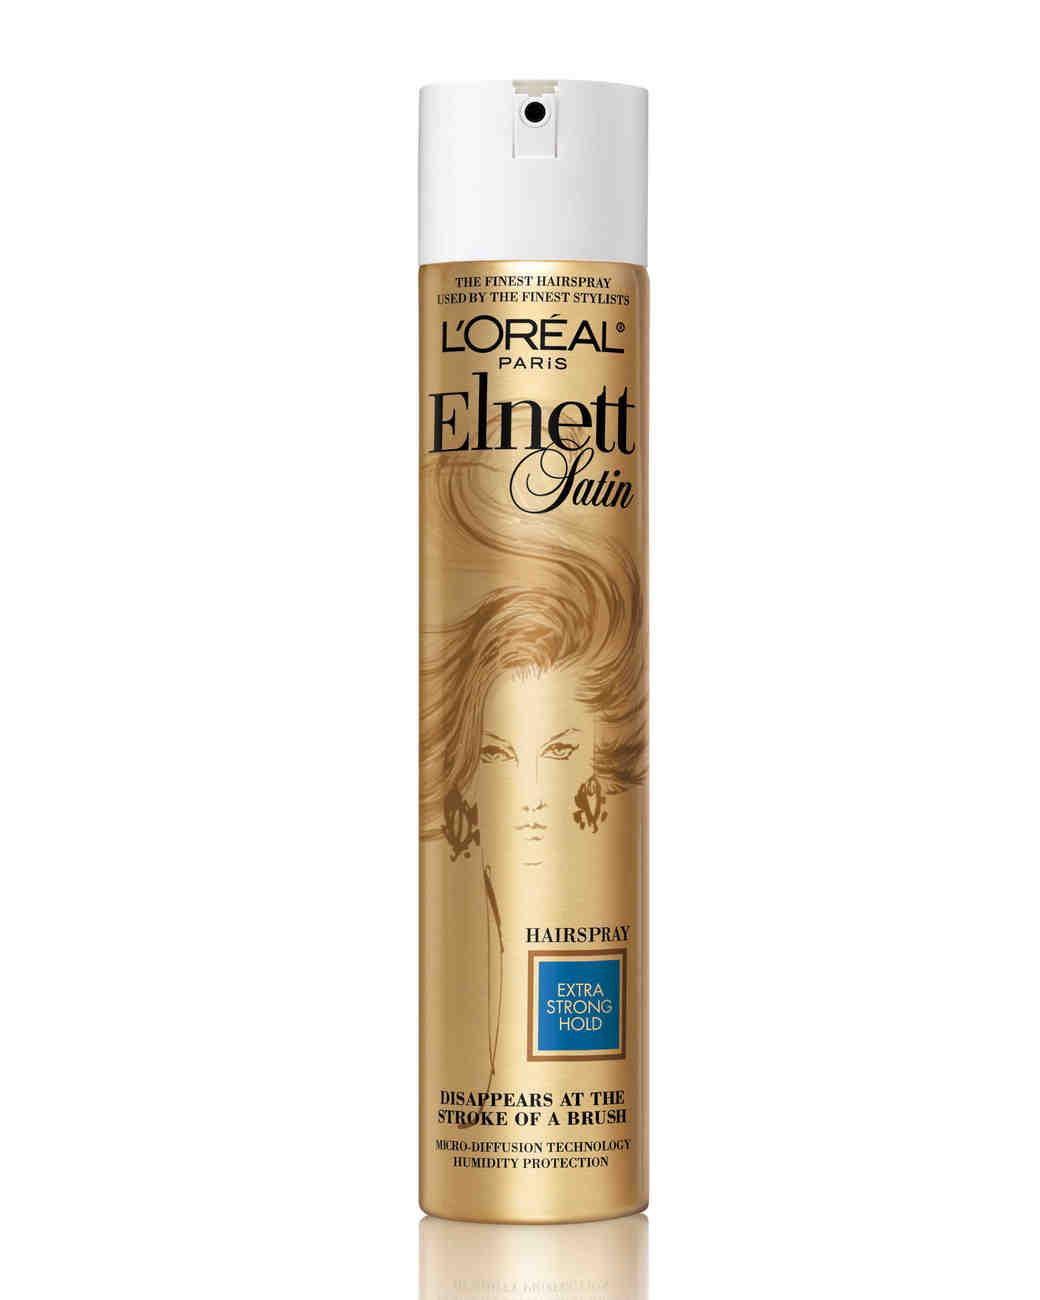 loreal-elnett-satin-hairspray-extra-strong-hold-0314.jpg